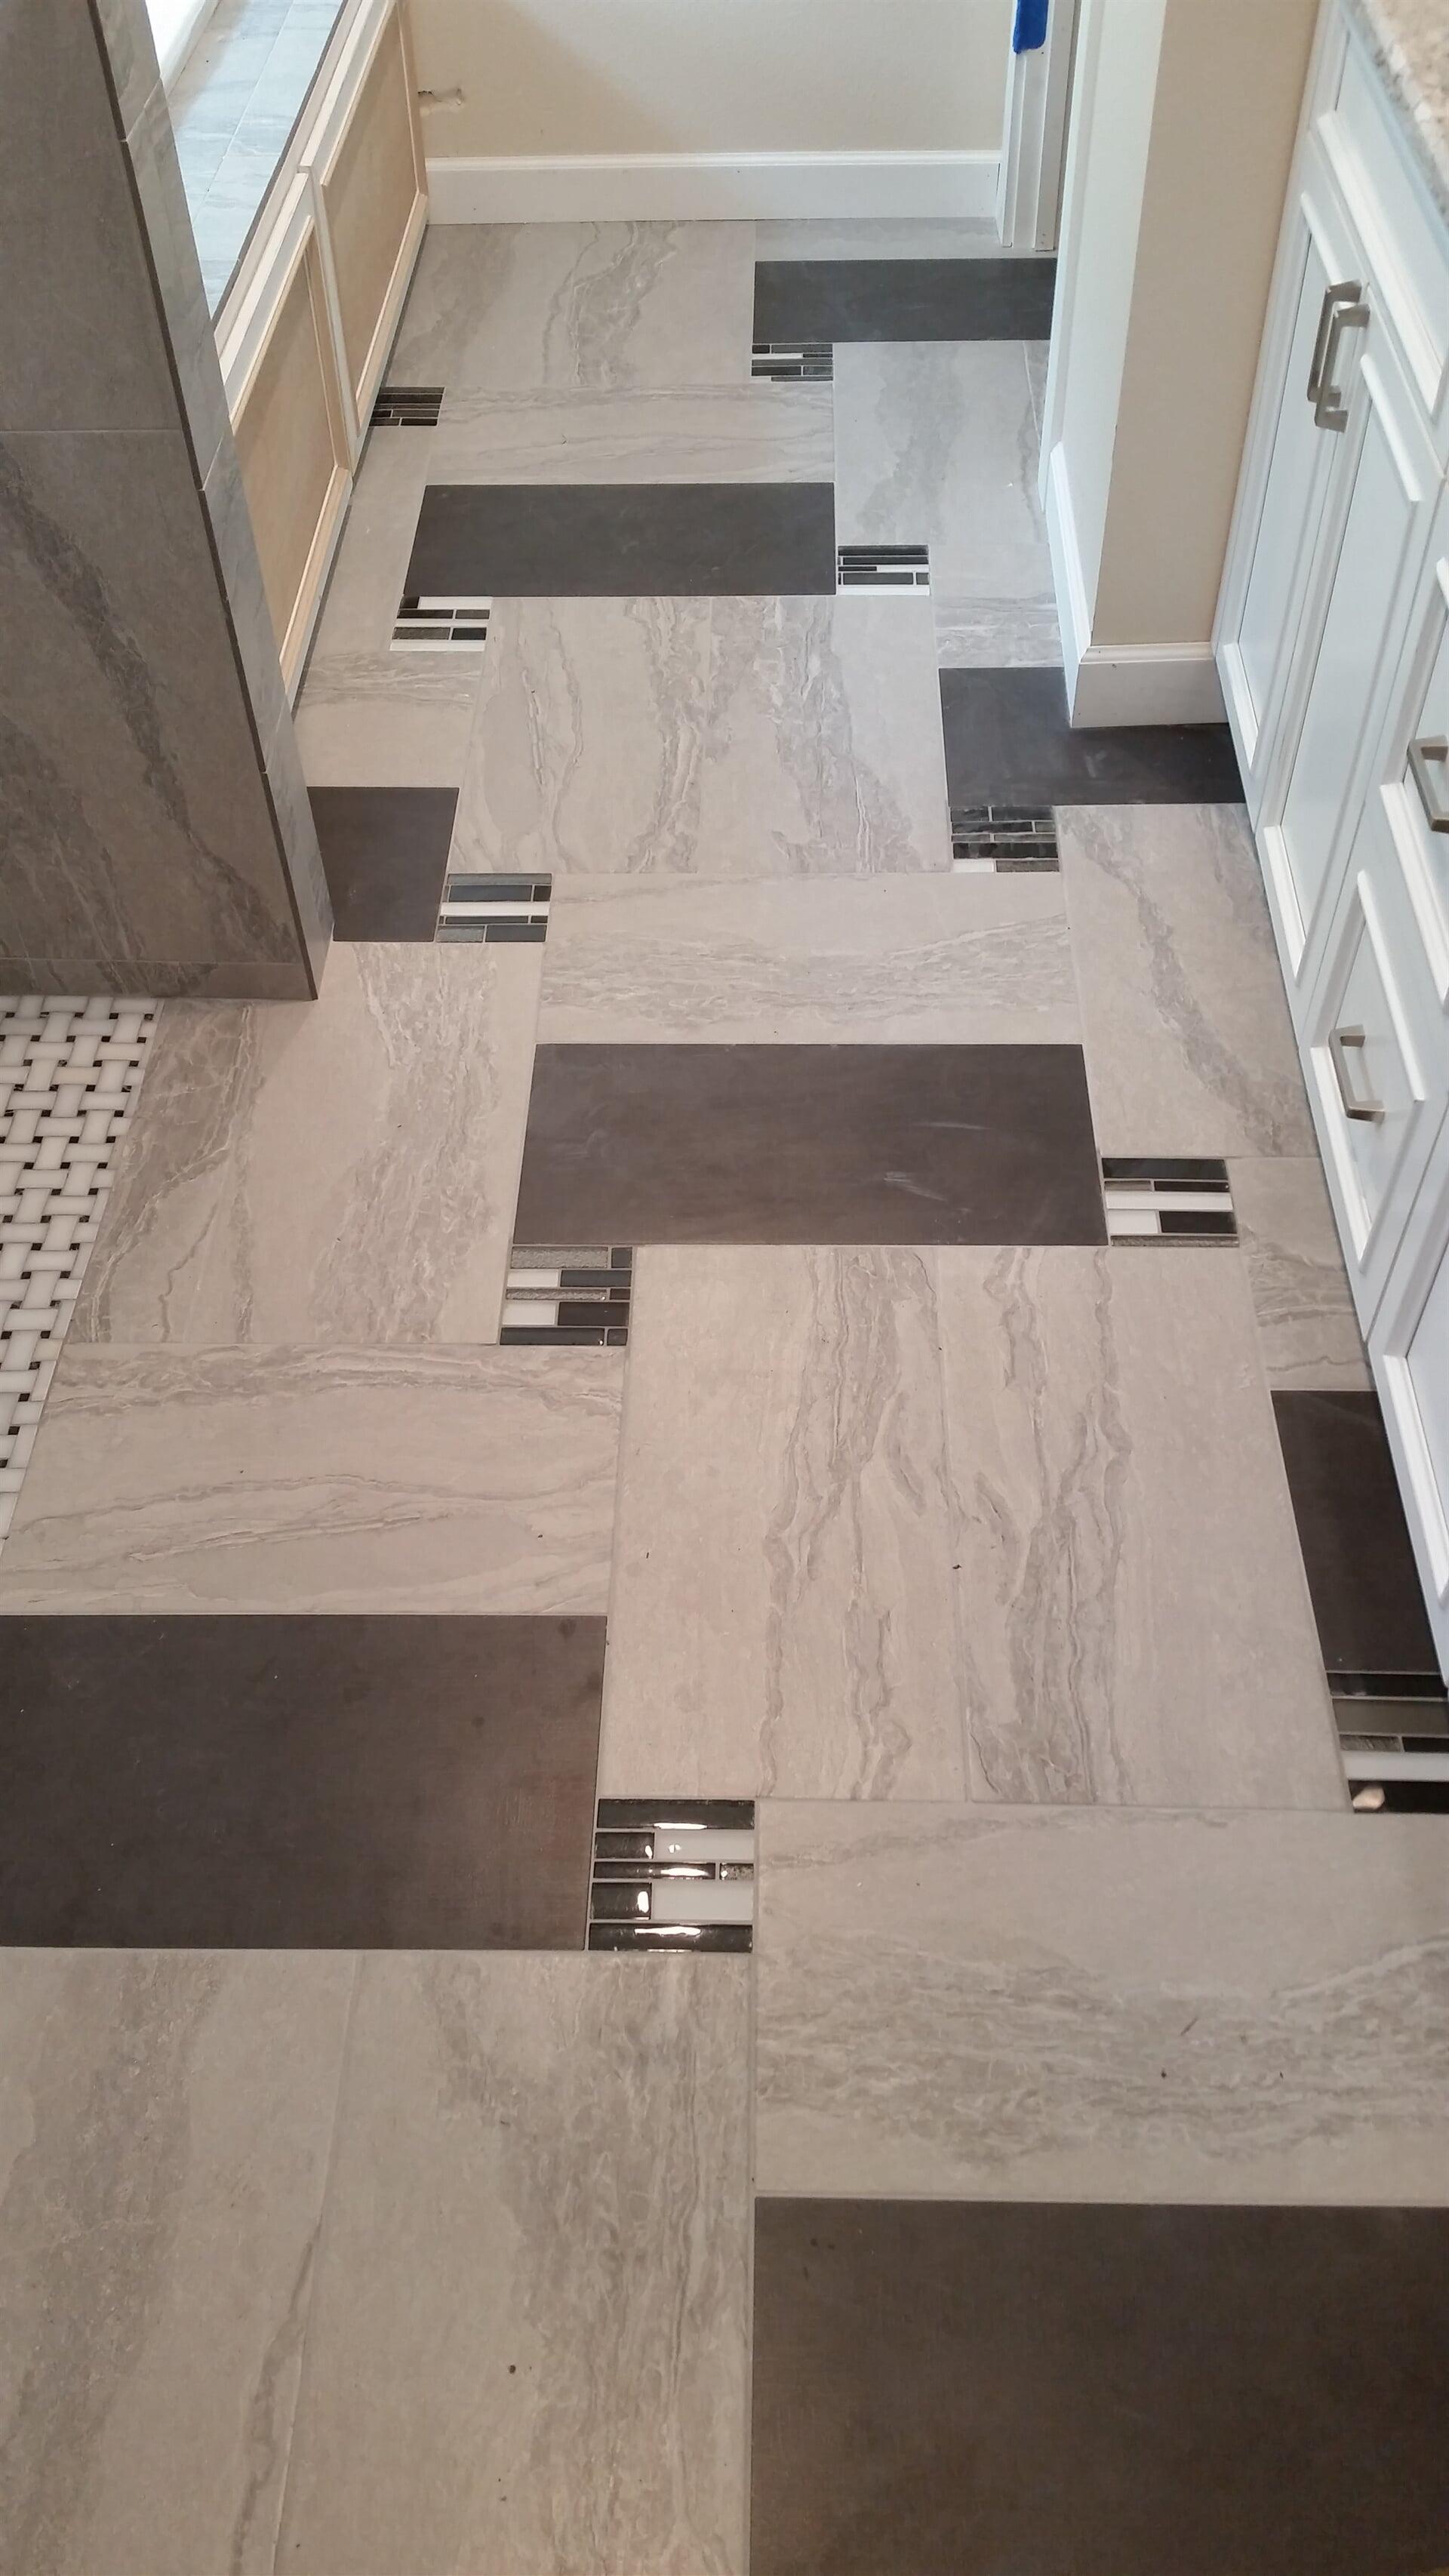 Custom tile flooring design in Dunedin, FL from Floor Depot